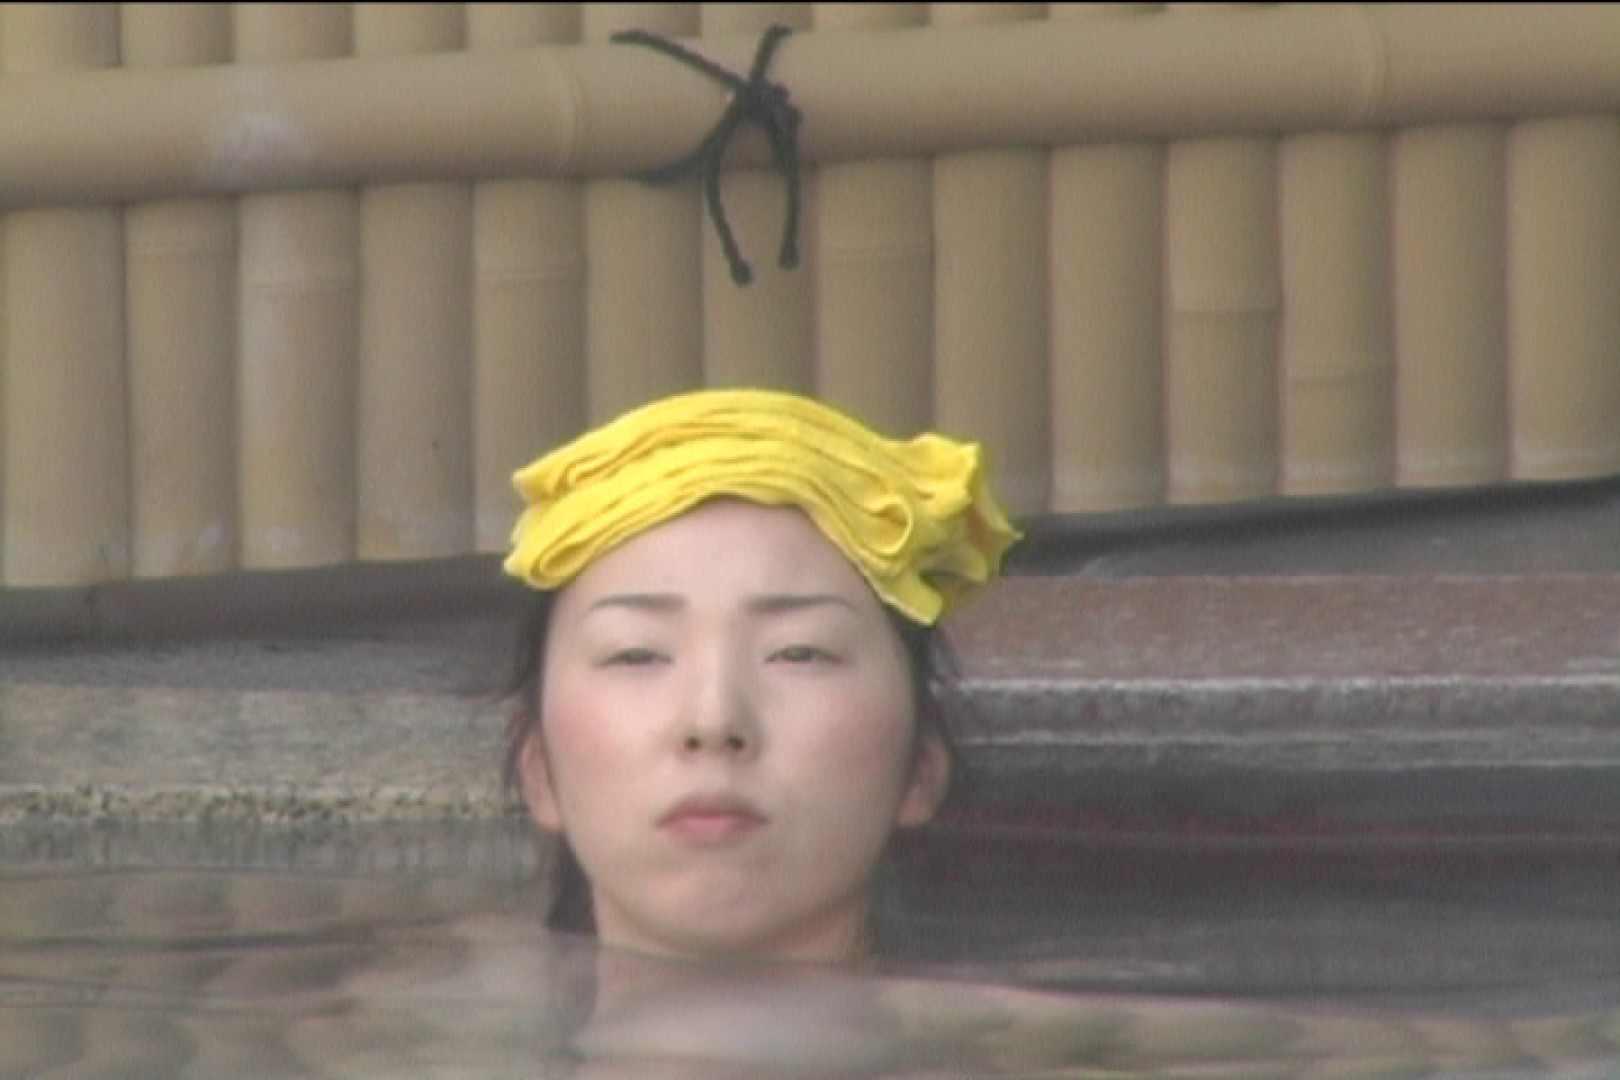 Aquaな露天風呂Vol.529 盗撮シリーズ | 露天風呂編  106PIX 7